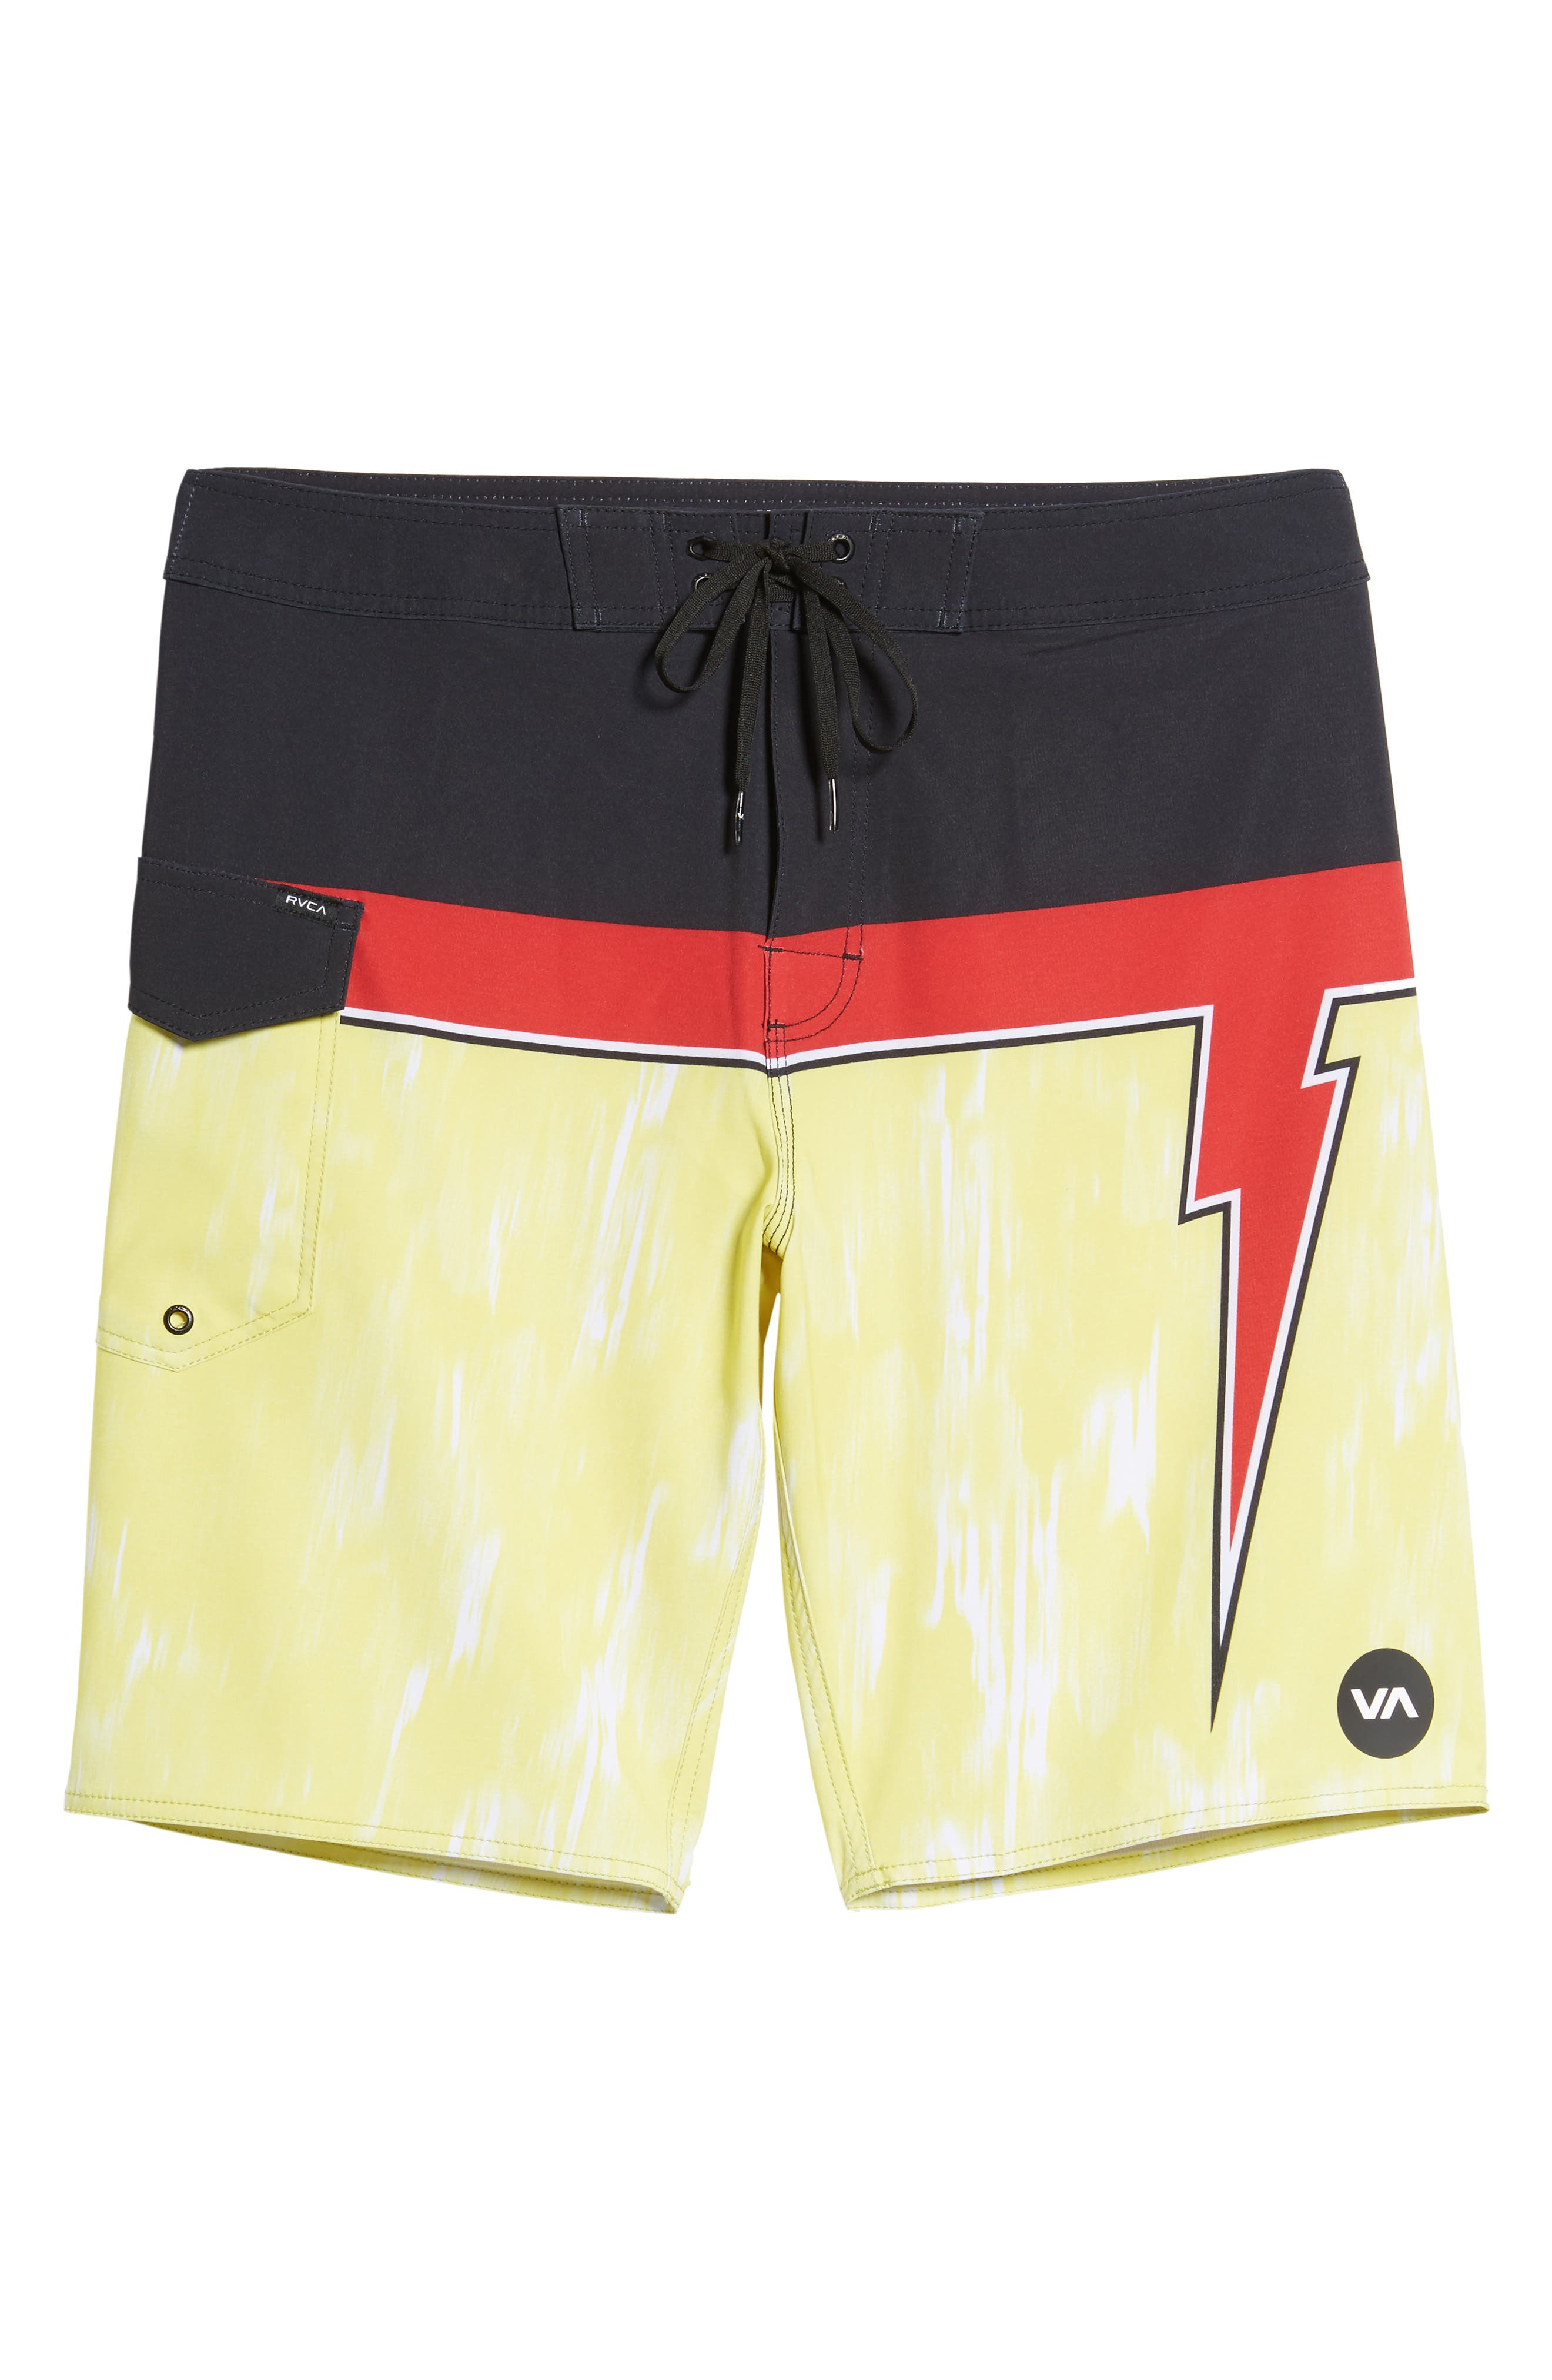 Makua Bolt Board Shorts,                             Alternate thumbnail 6, color,                             740